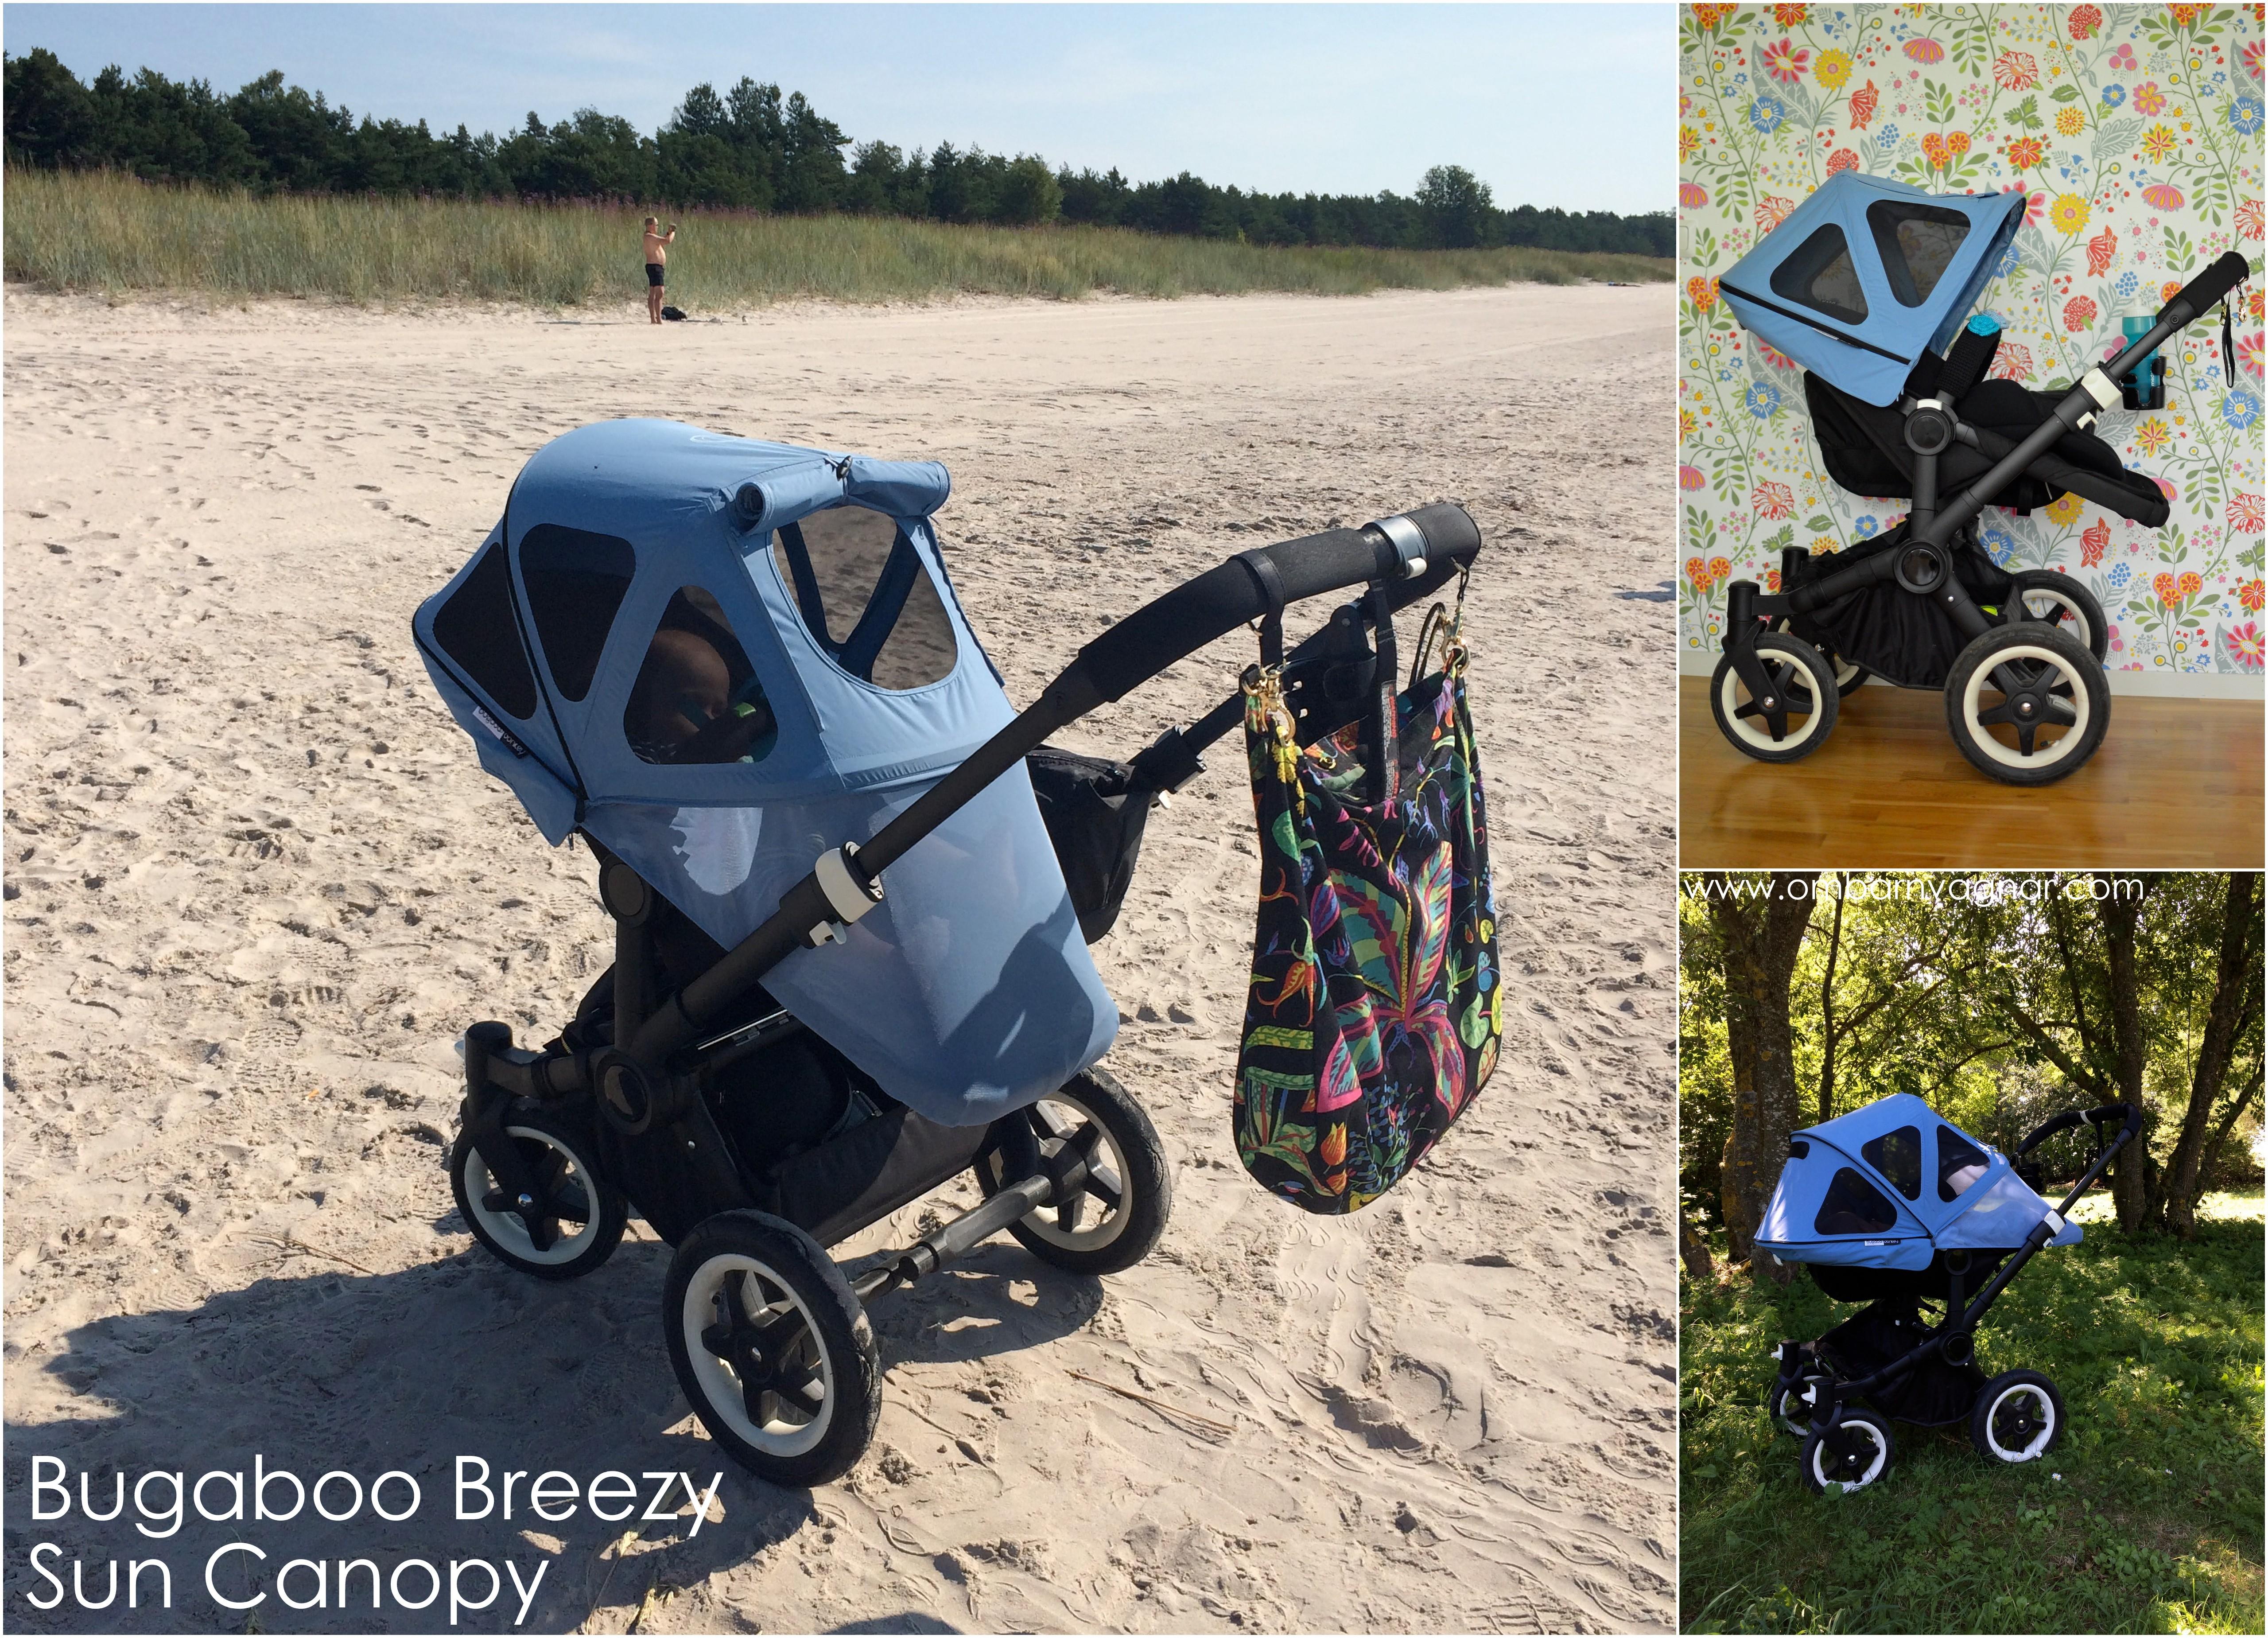 Bugaboo Donkey med Breezy Ice Blue Solsufflett recension